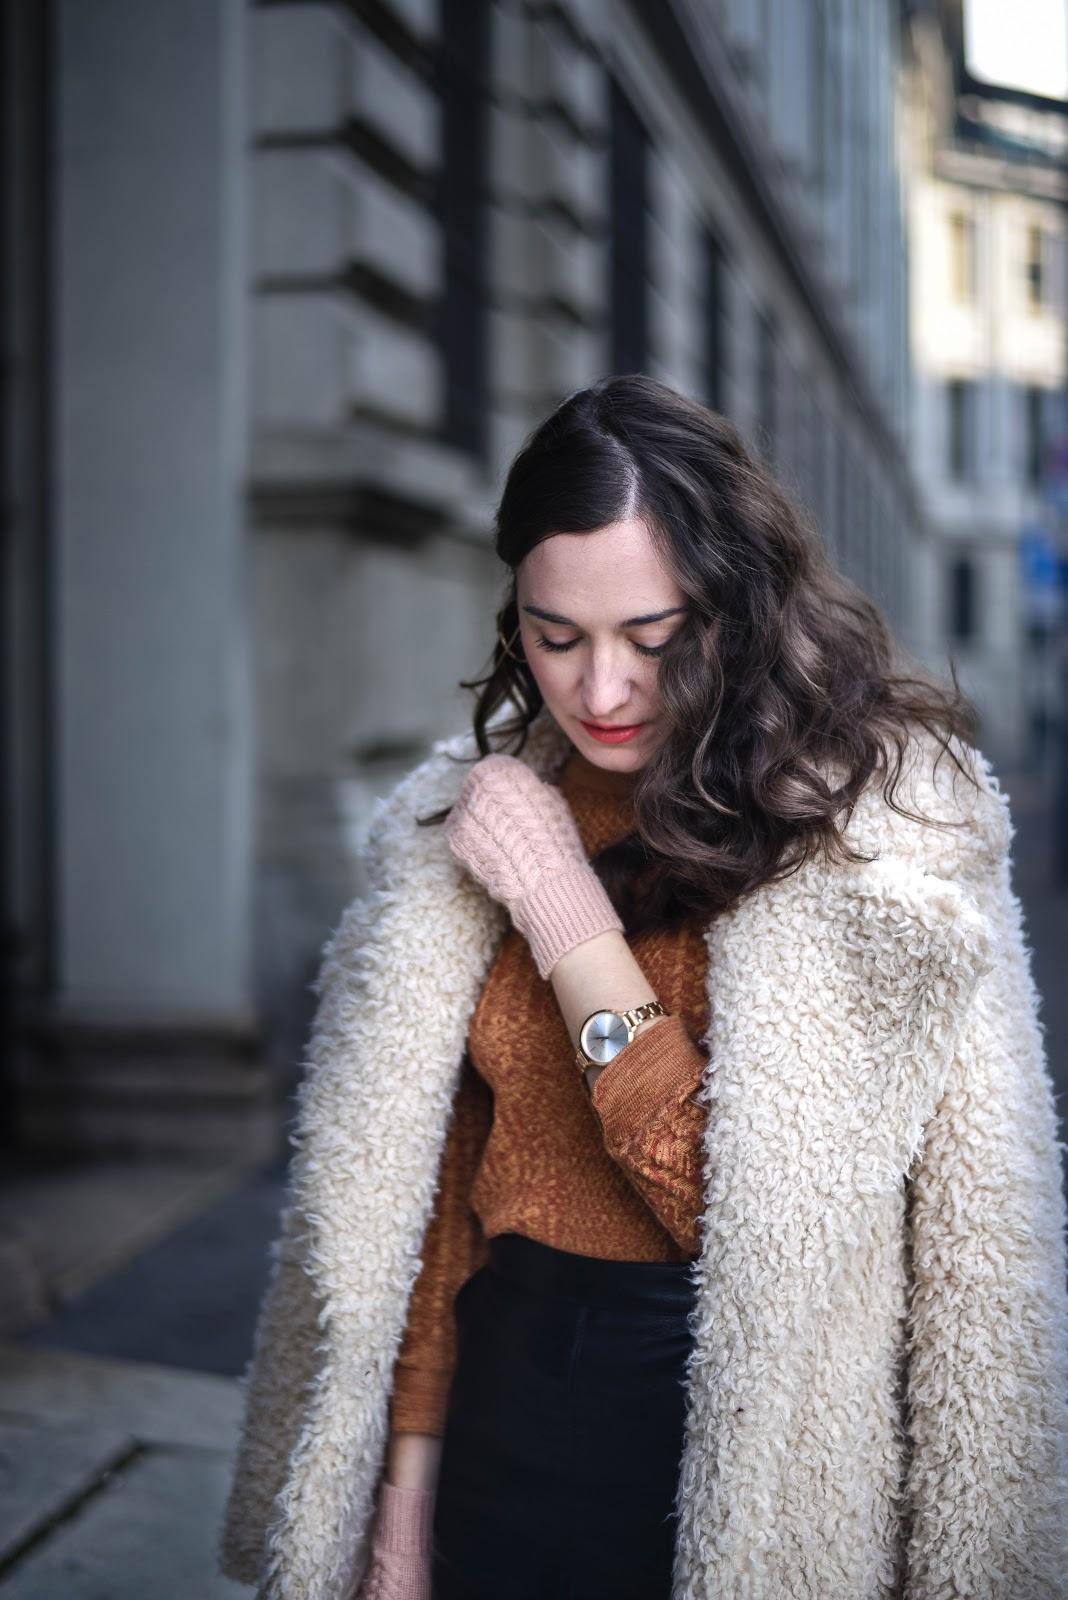 leather_skirt_fur_coat_mustard_knit_look